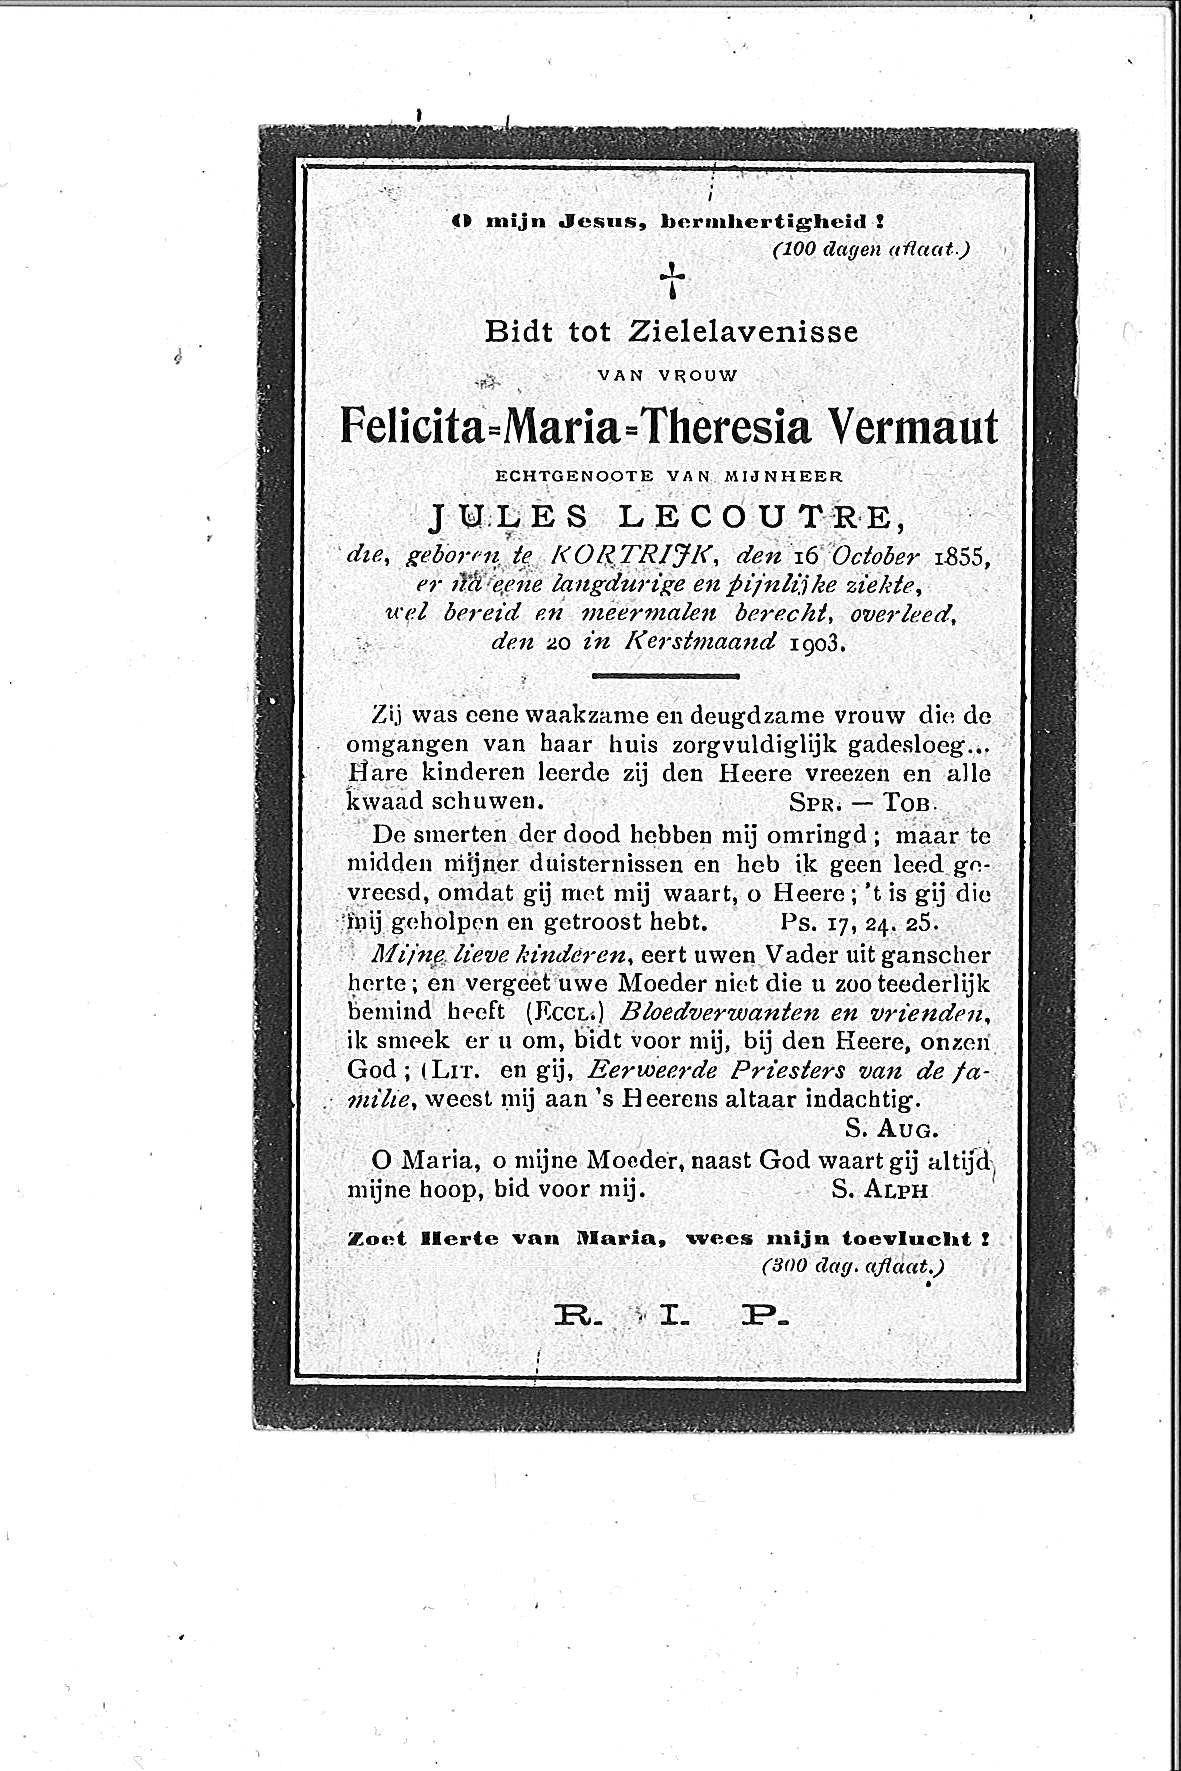 Felicita-Maria-Theresia(1903)20141210102121_00005.jpg